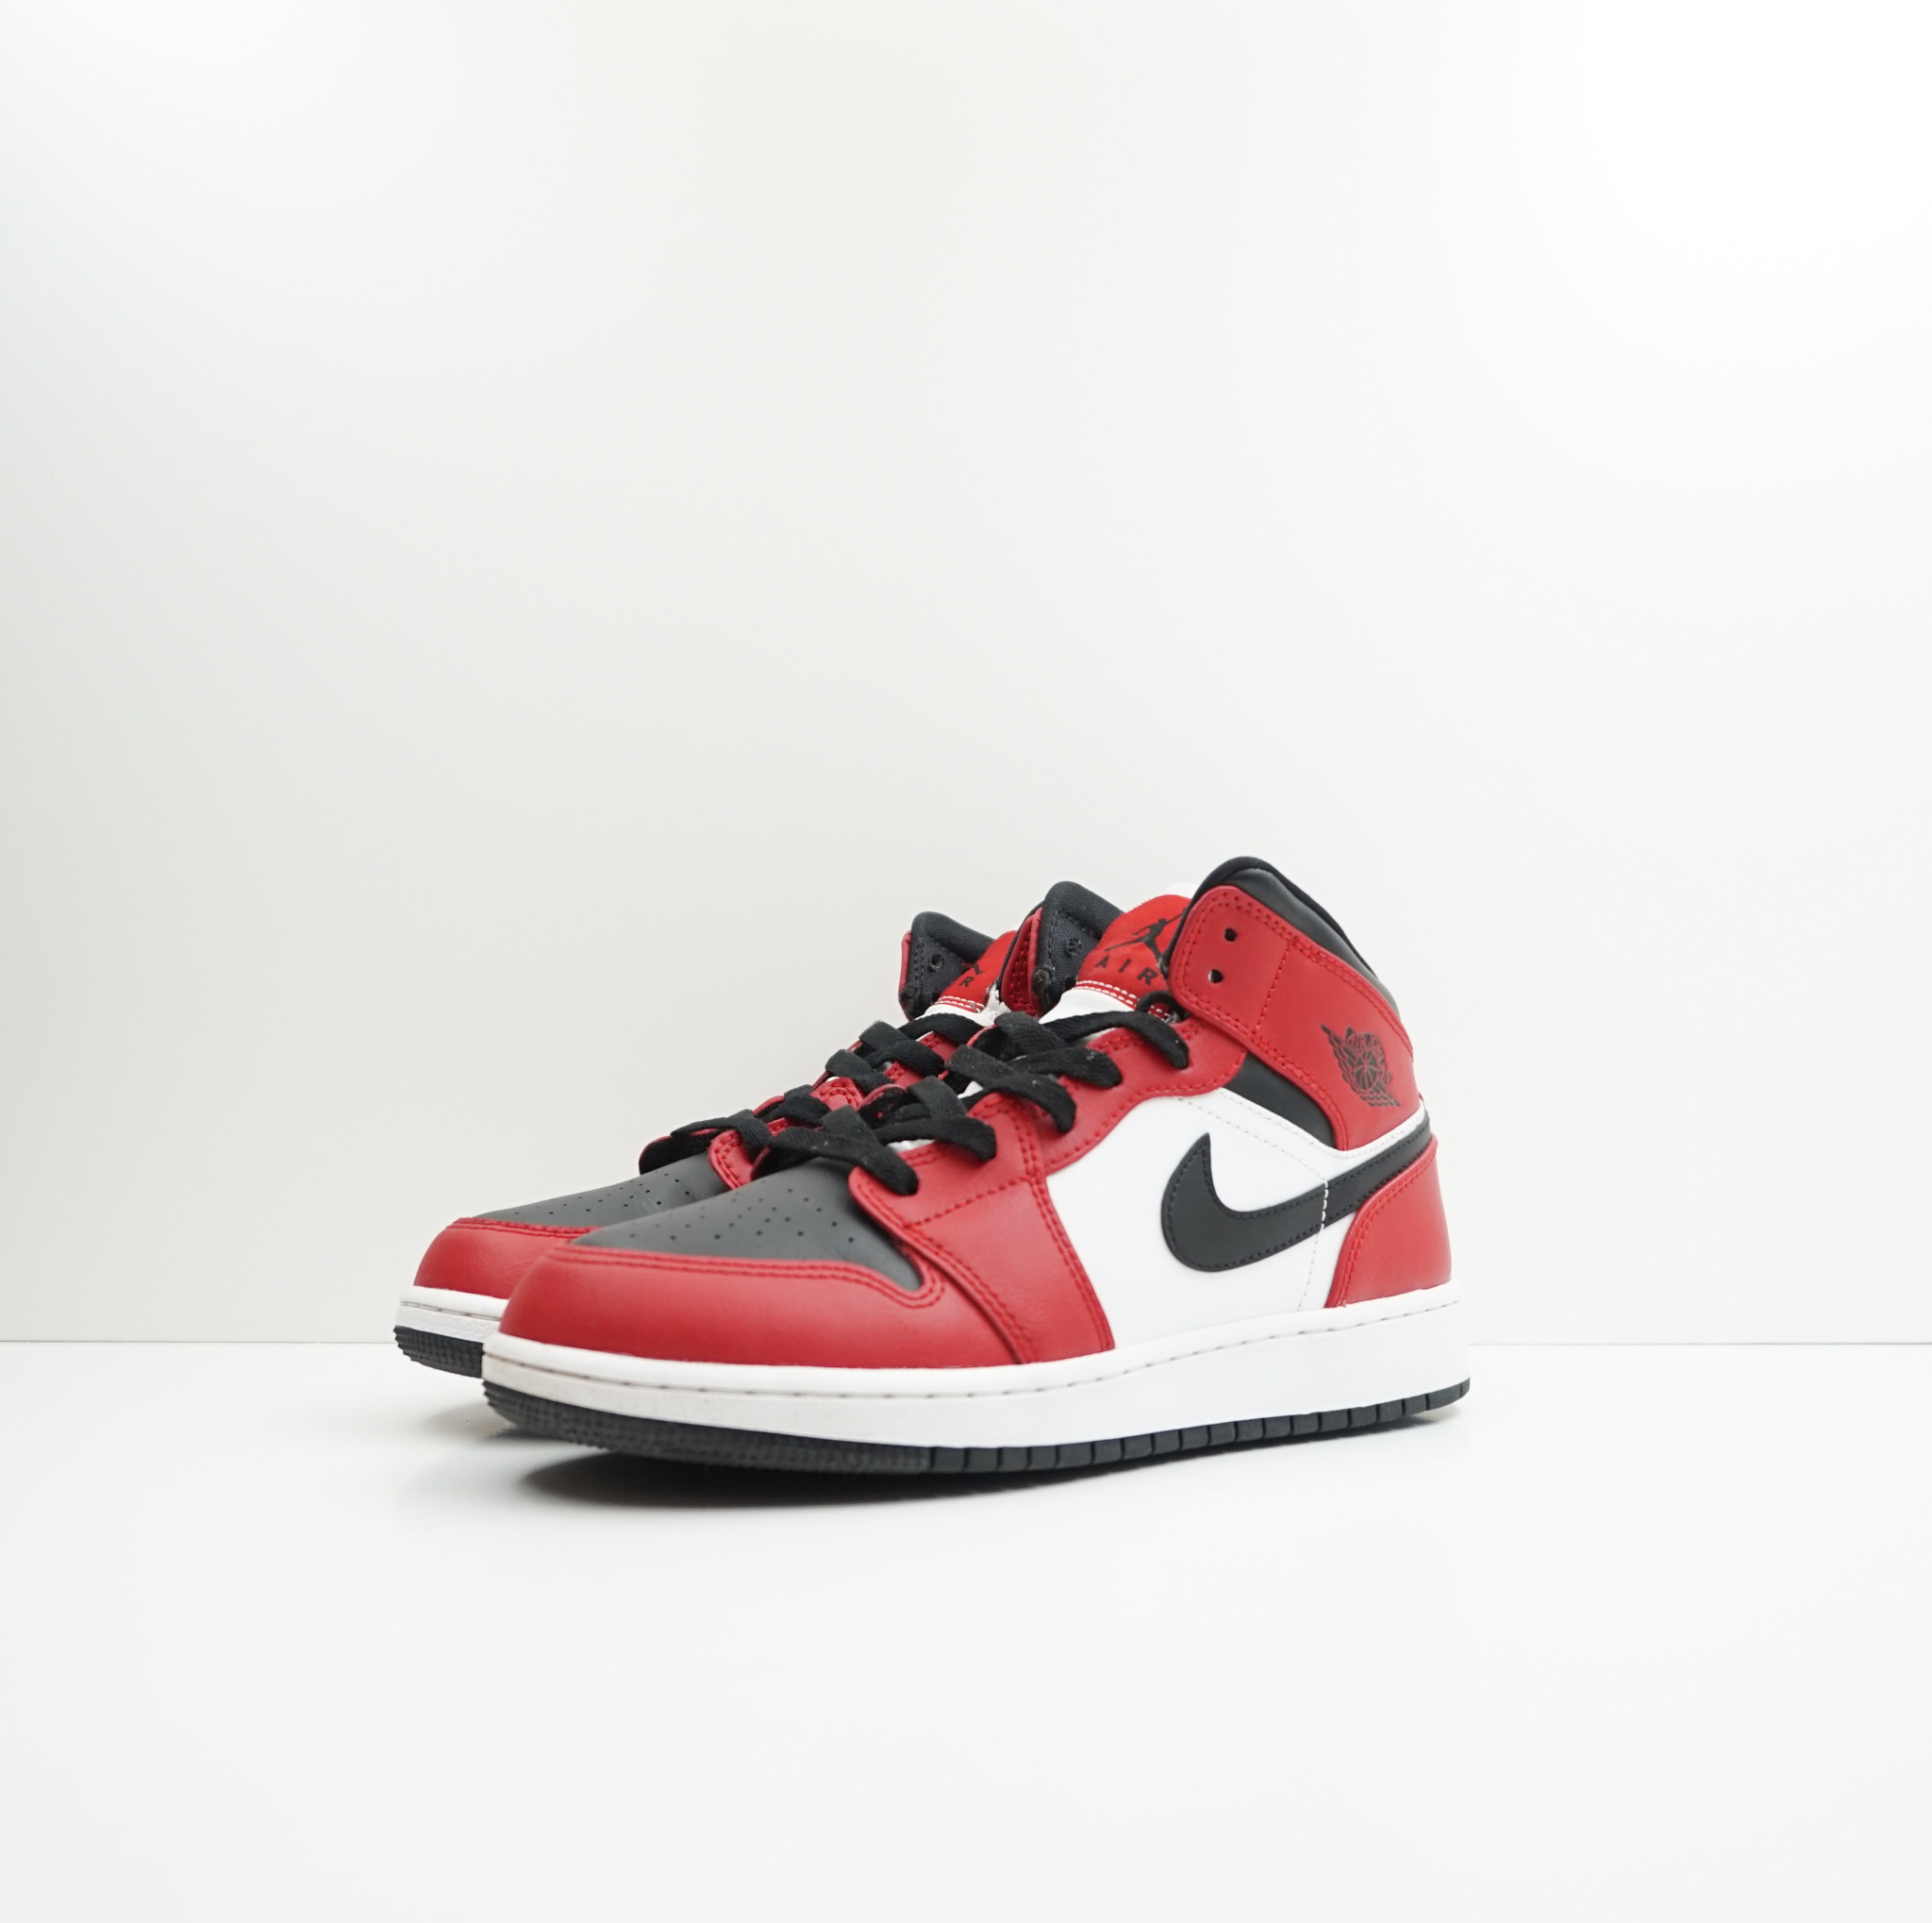 Jordan 1 Mid Chicago Black Toe (GS)